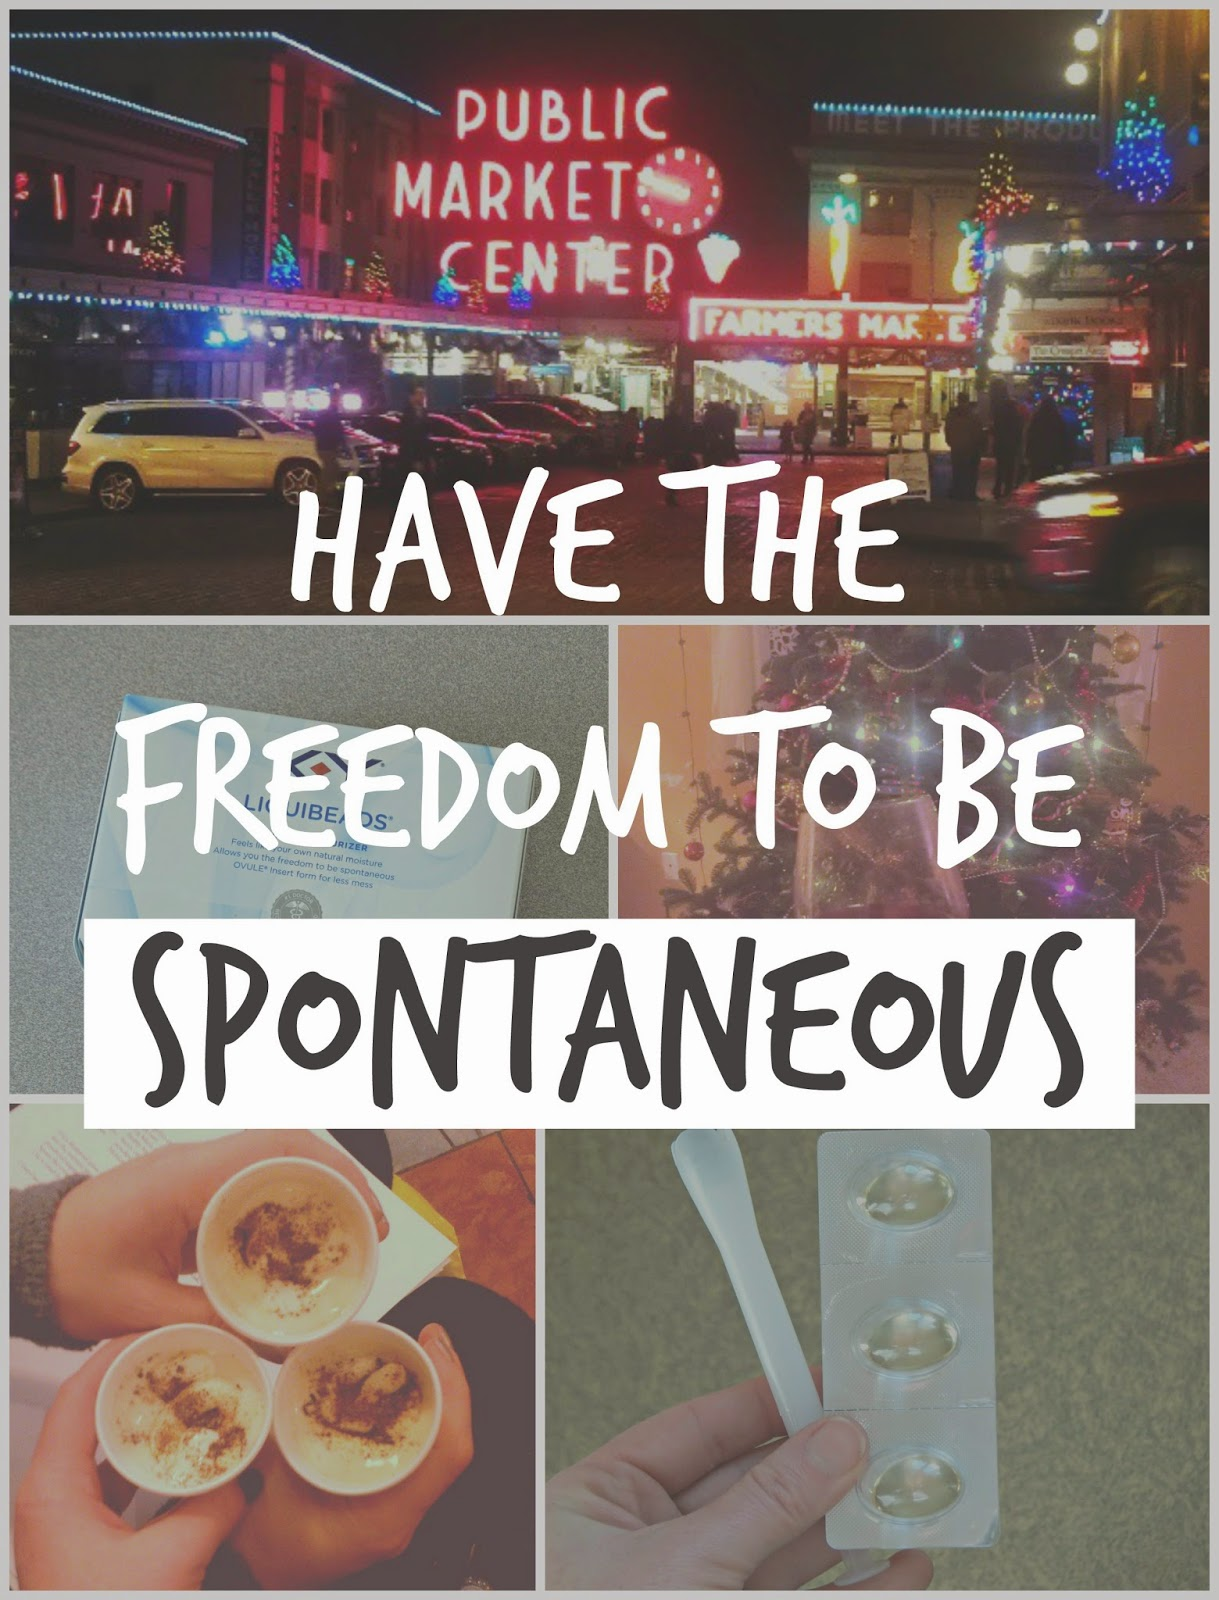 The Freedom to be spontaneous #themoodstrikes #ad #cbias